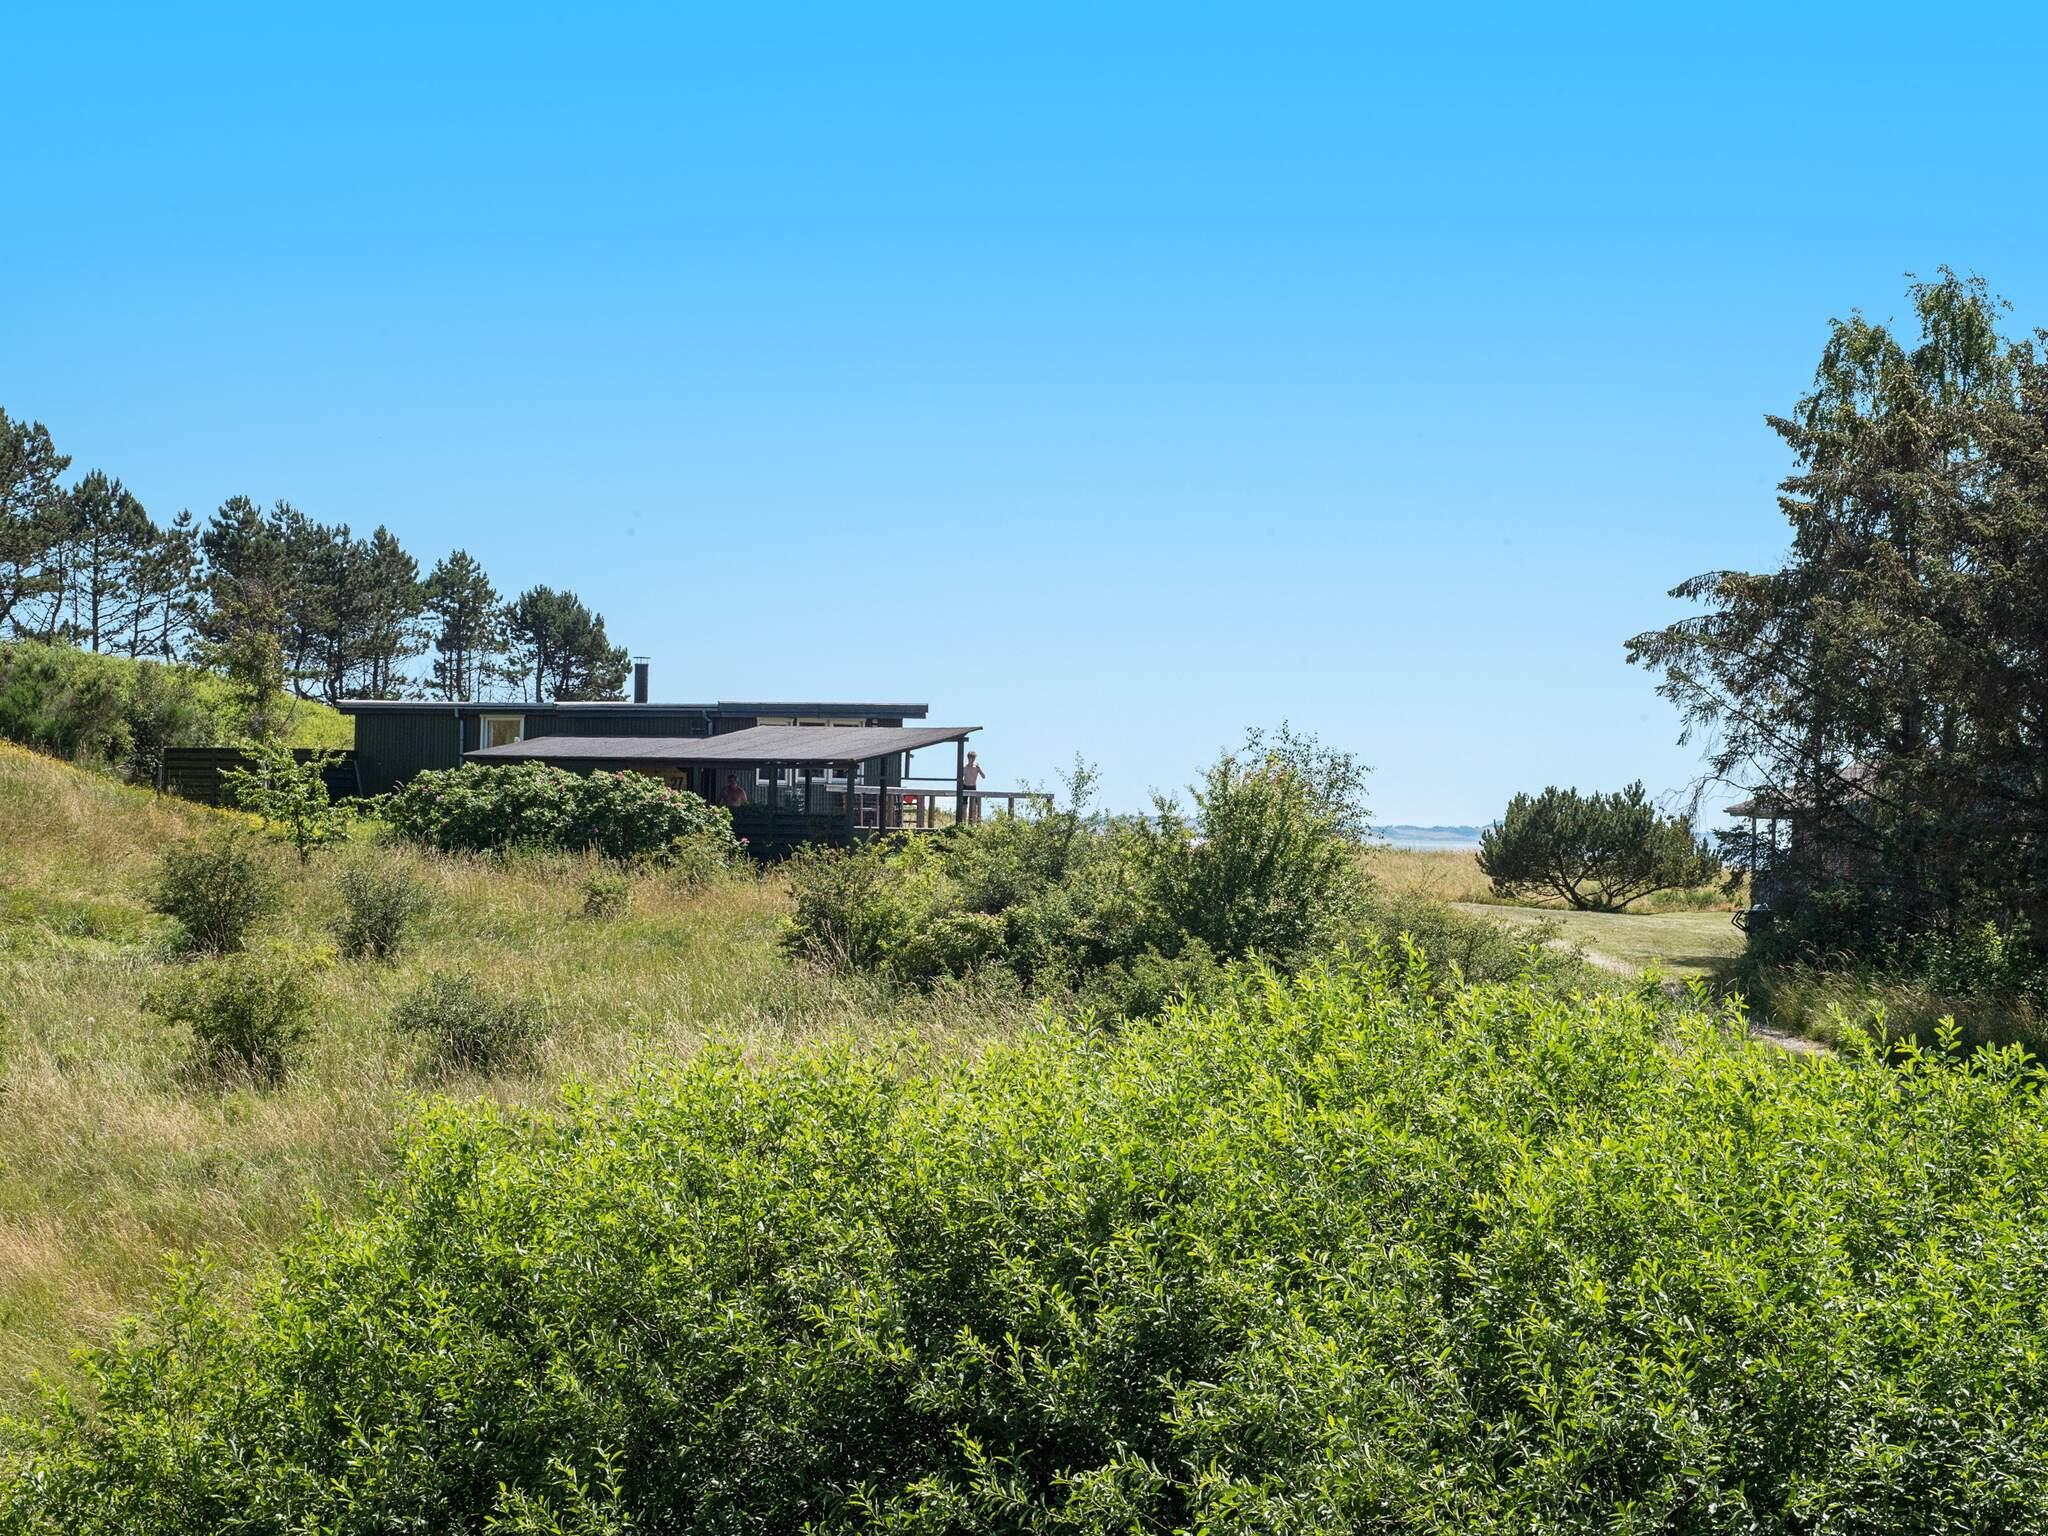 Maison de vacances Helgenæs (2597444), Knebel, , Mer Baltique danoise, Danemark, image 26